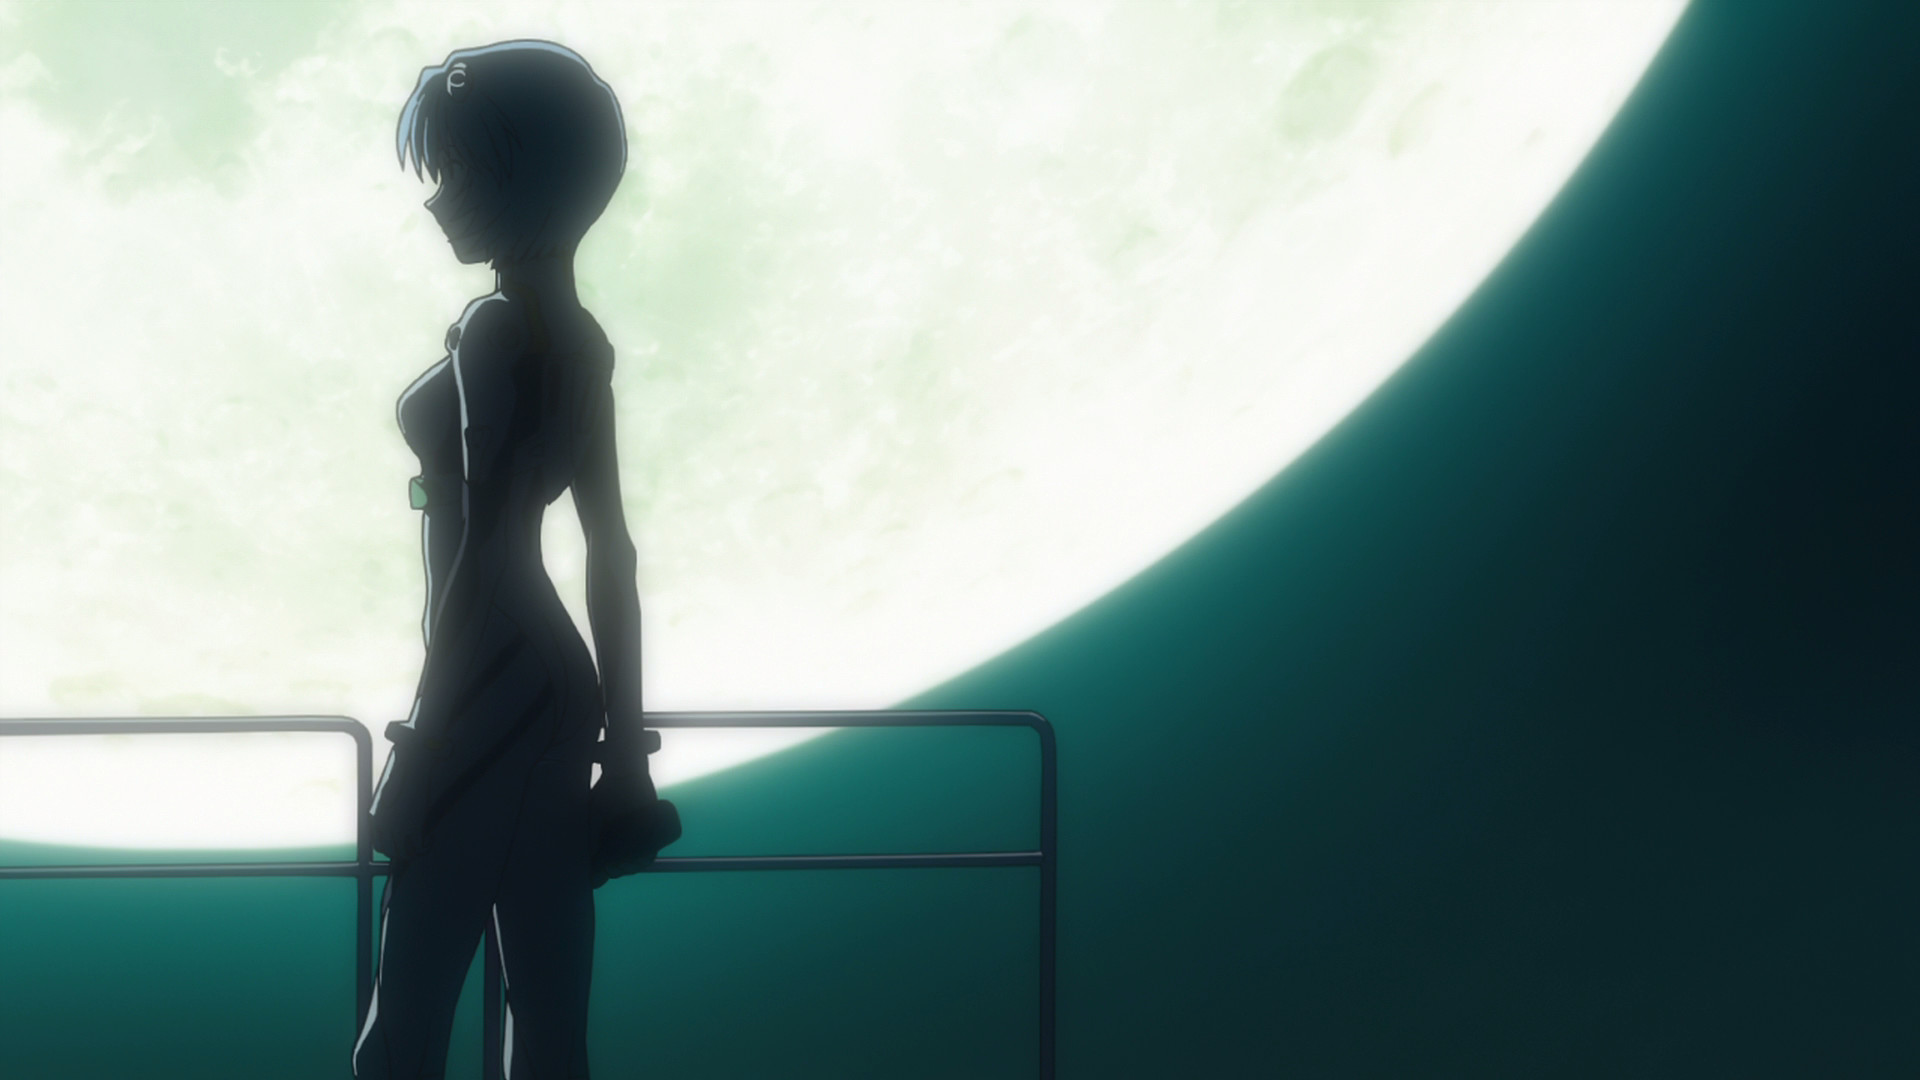 Anime Ayanami Rei Neon Genesis Evangelion silhouette